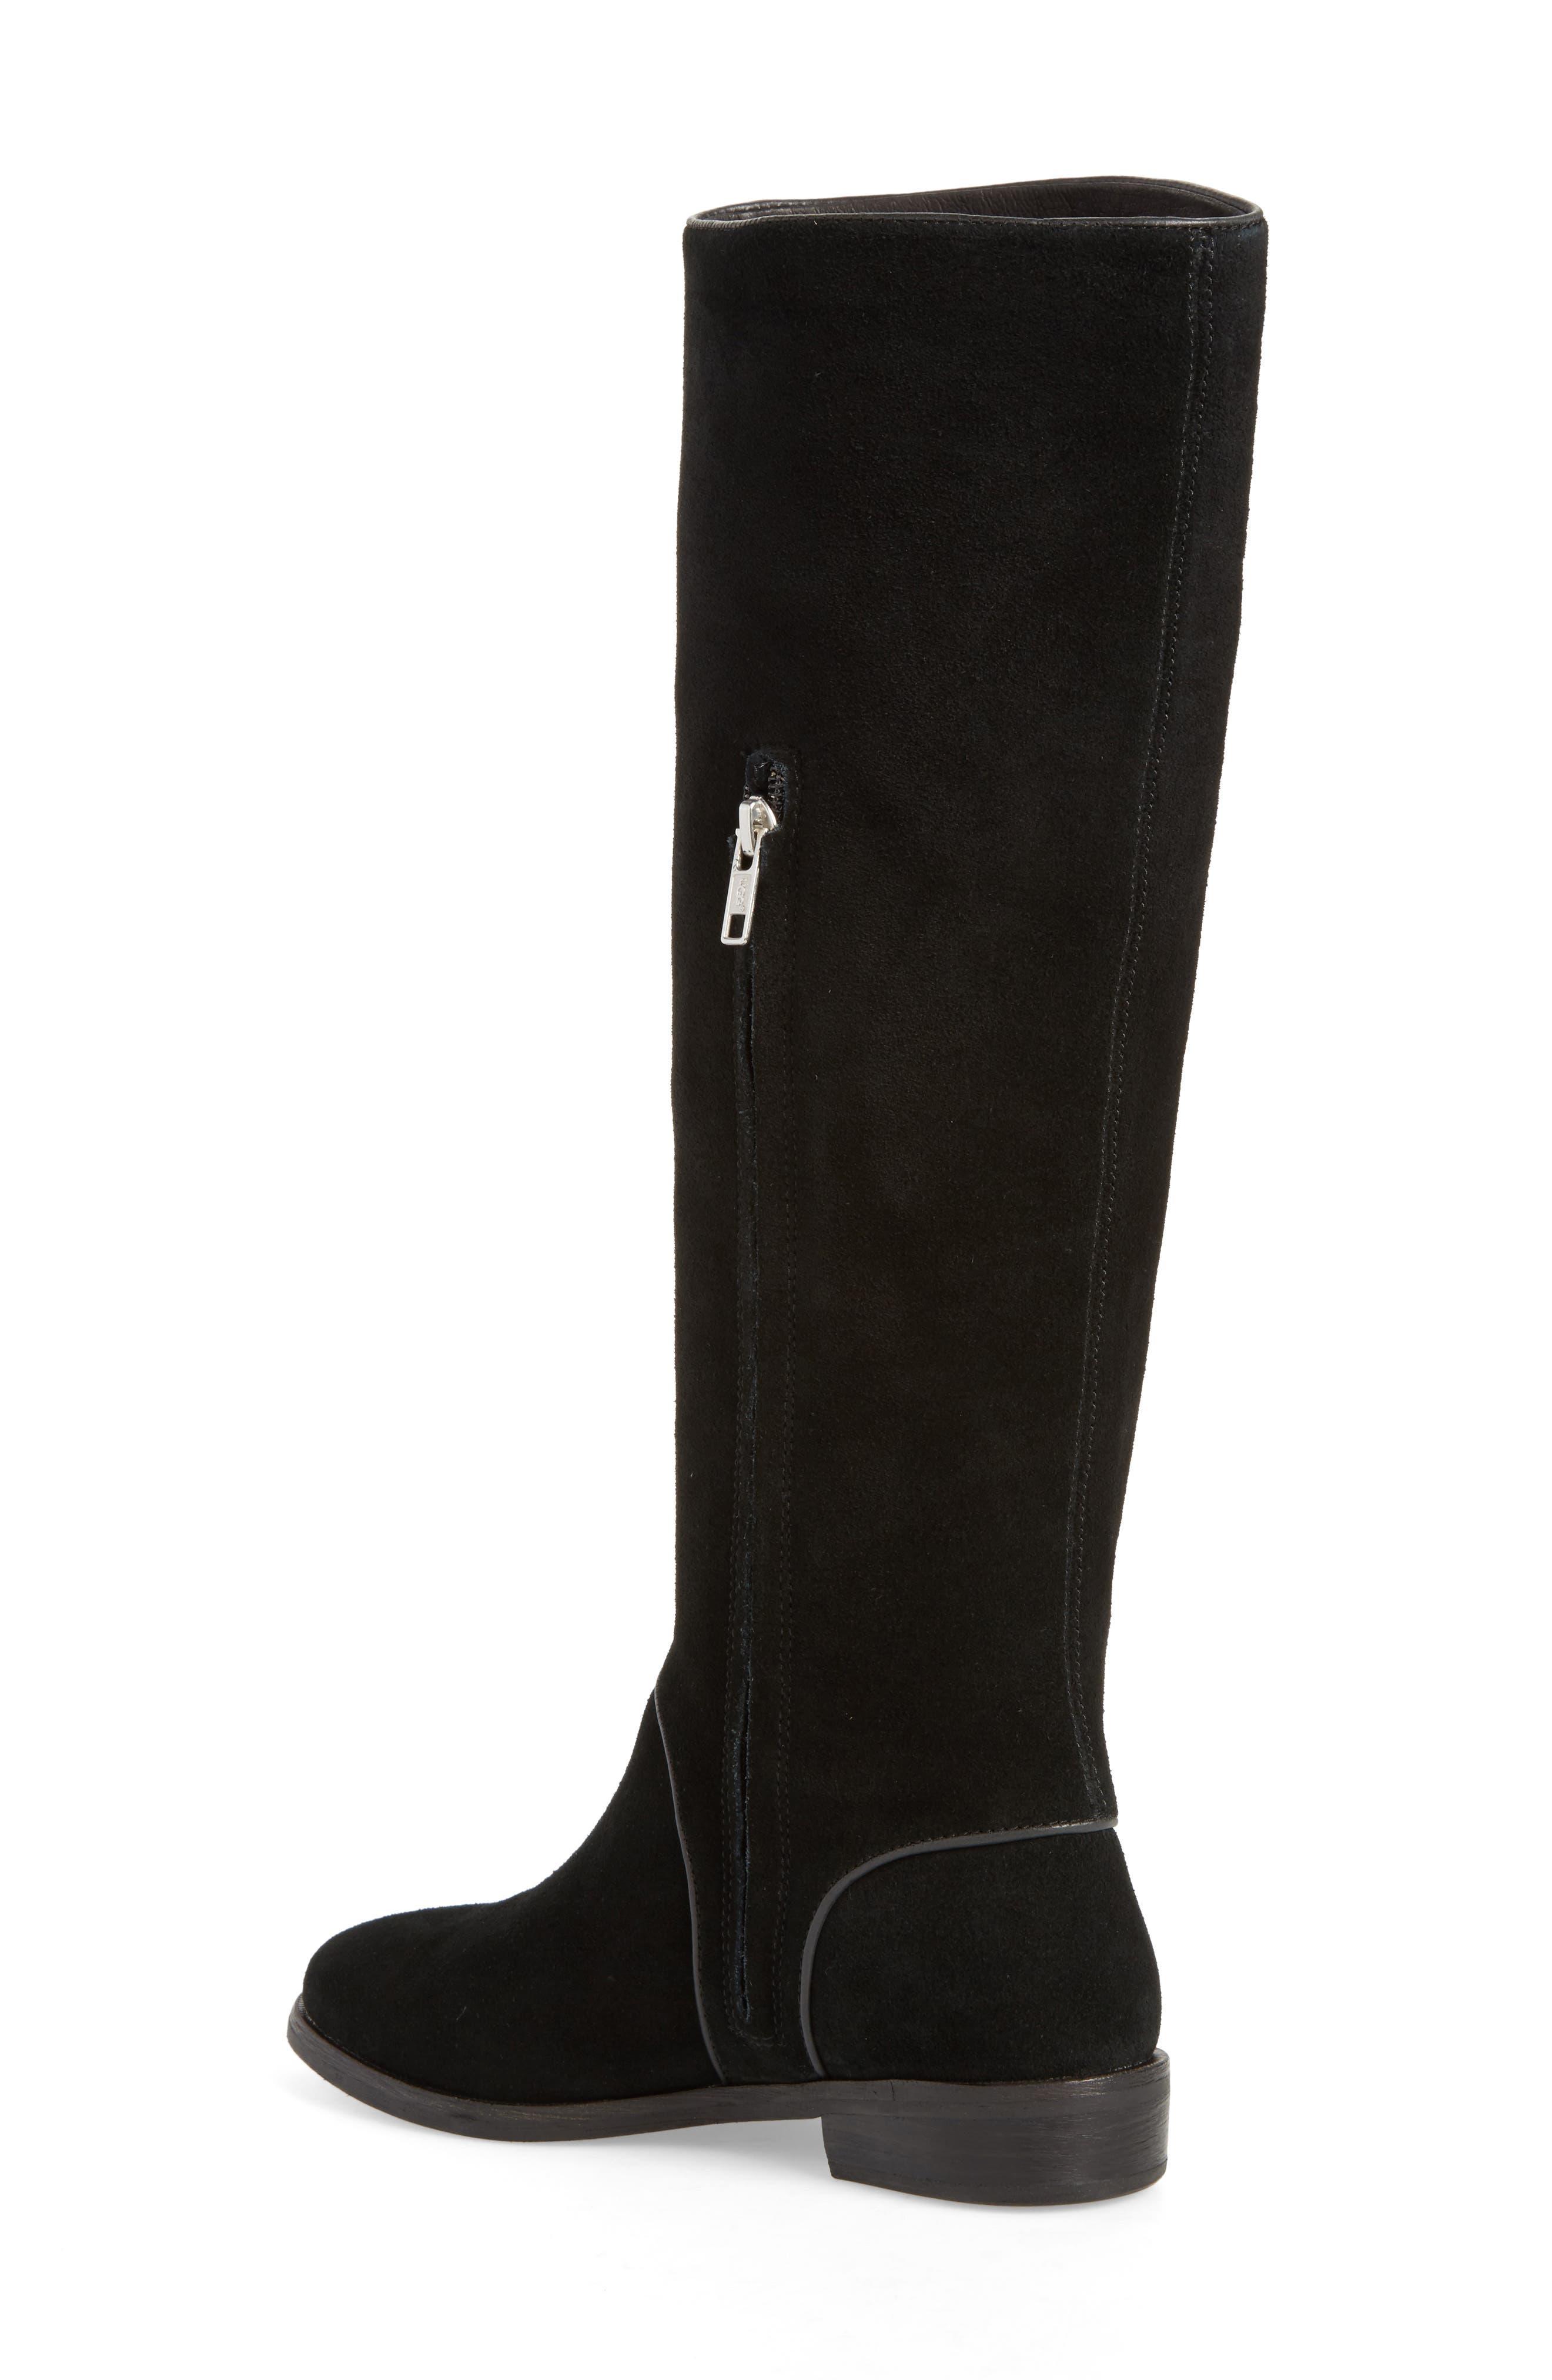 Gracen Knee High Boot,                             Alternate thumbnail 2, color,                             Black Suede